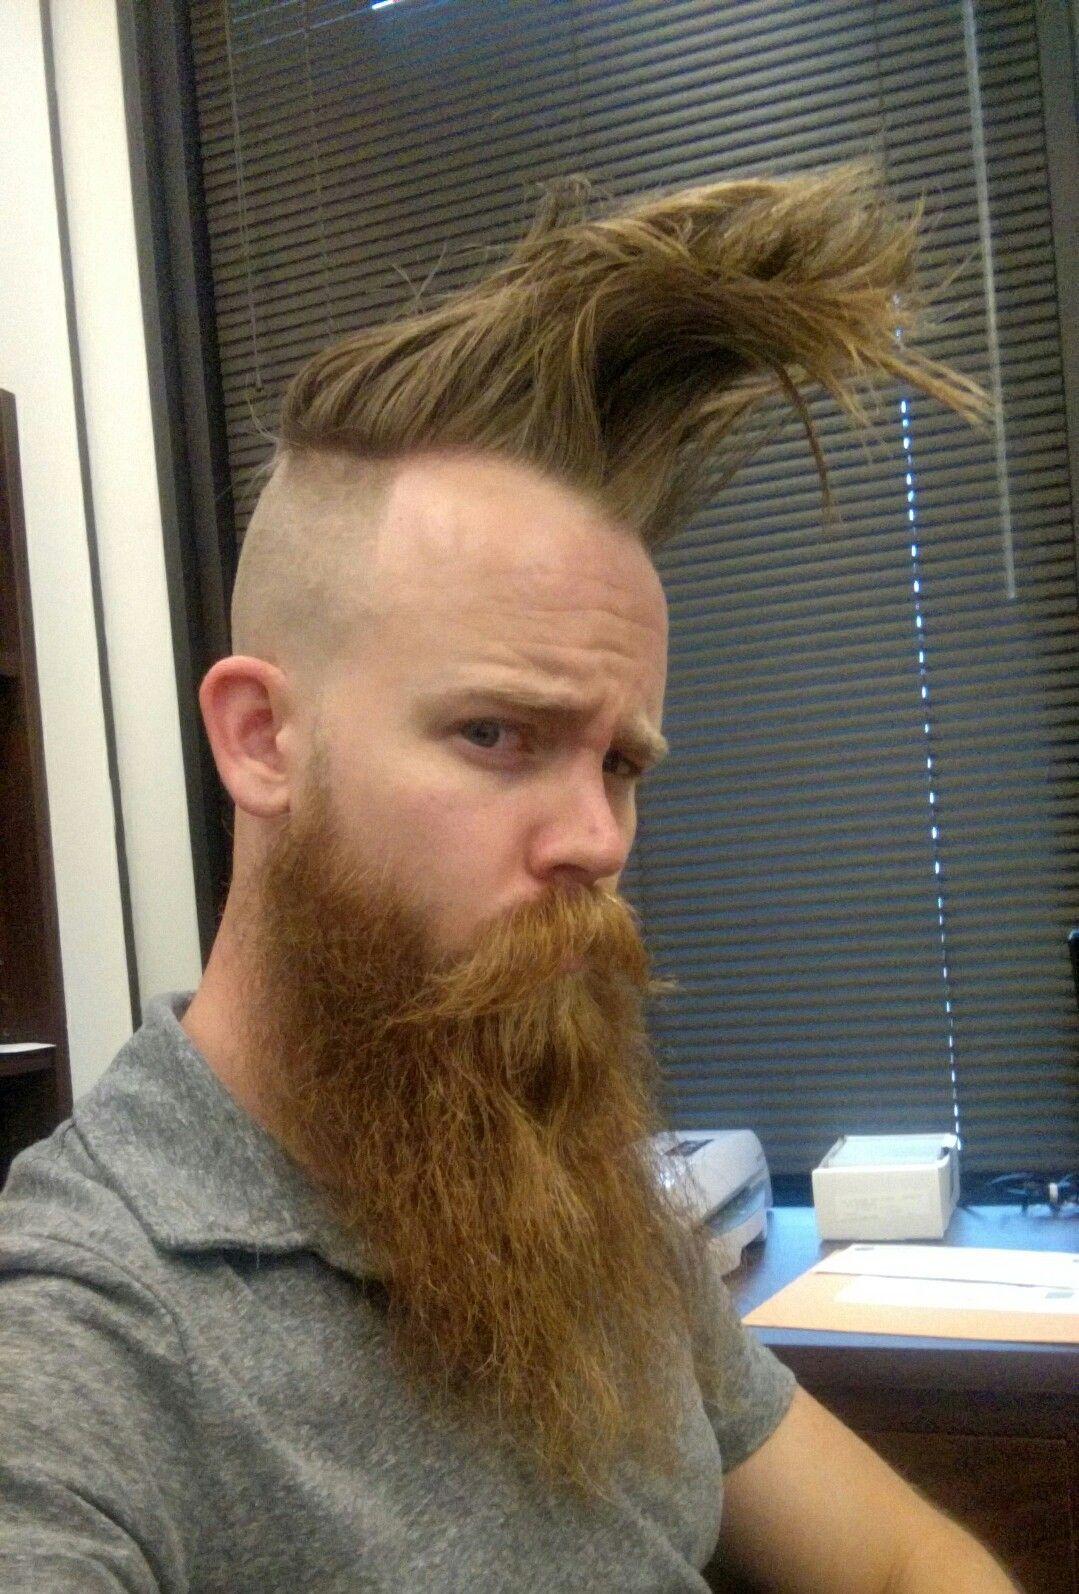 Redhead boy haircuts  concepts of cool beard styles popularbeardstylesbeard